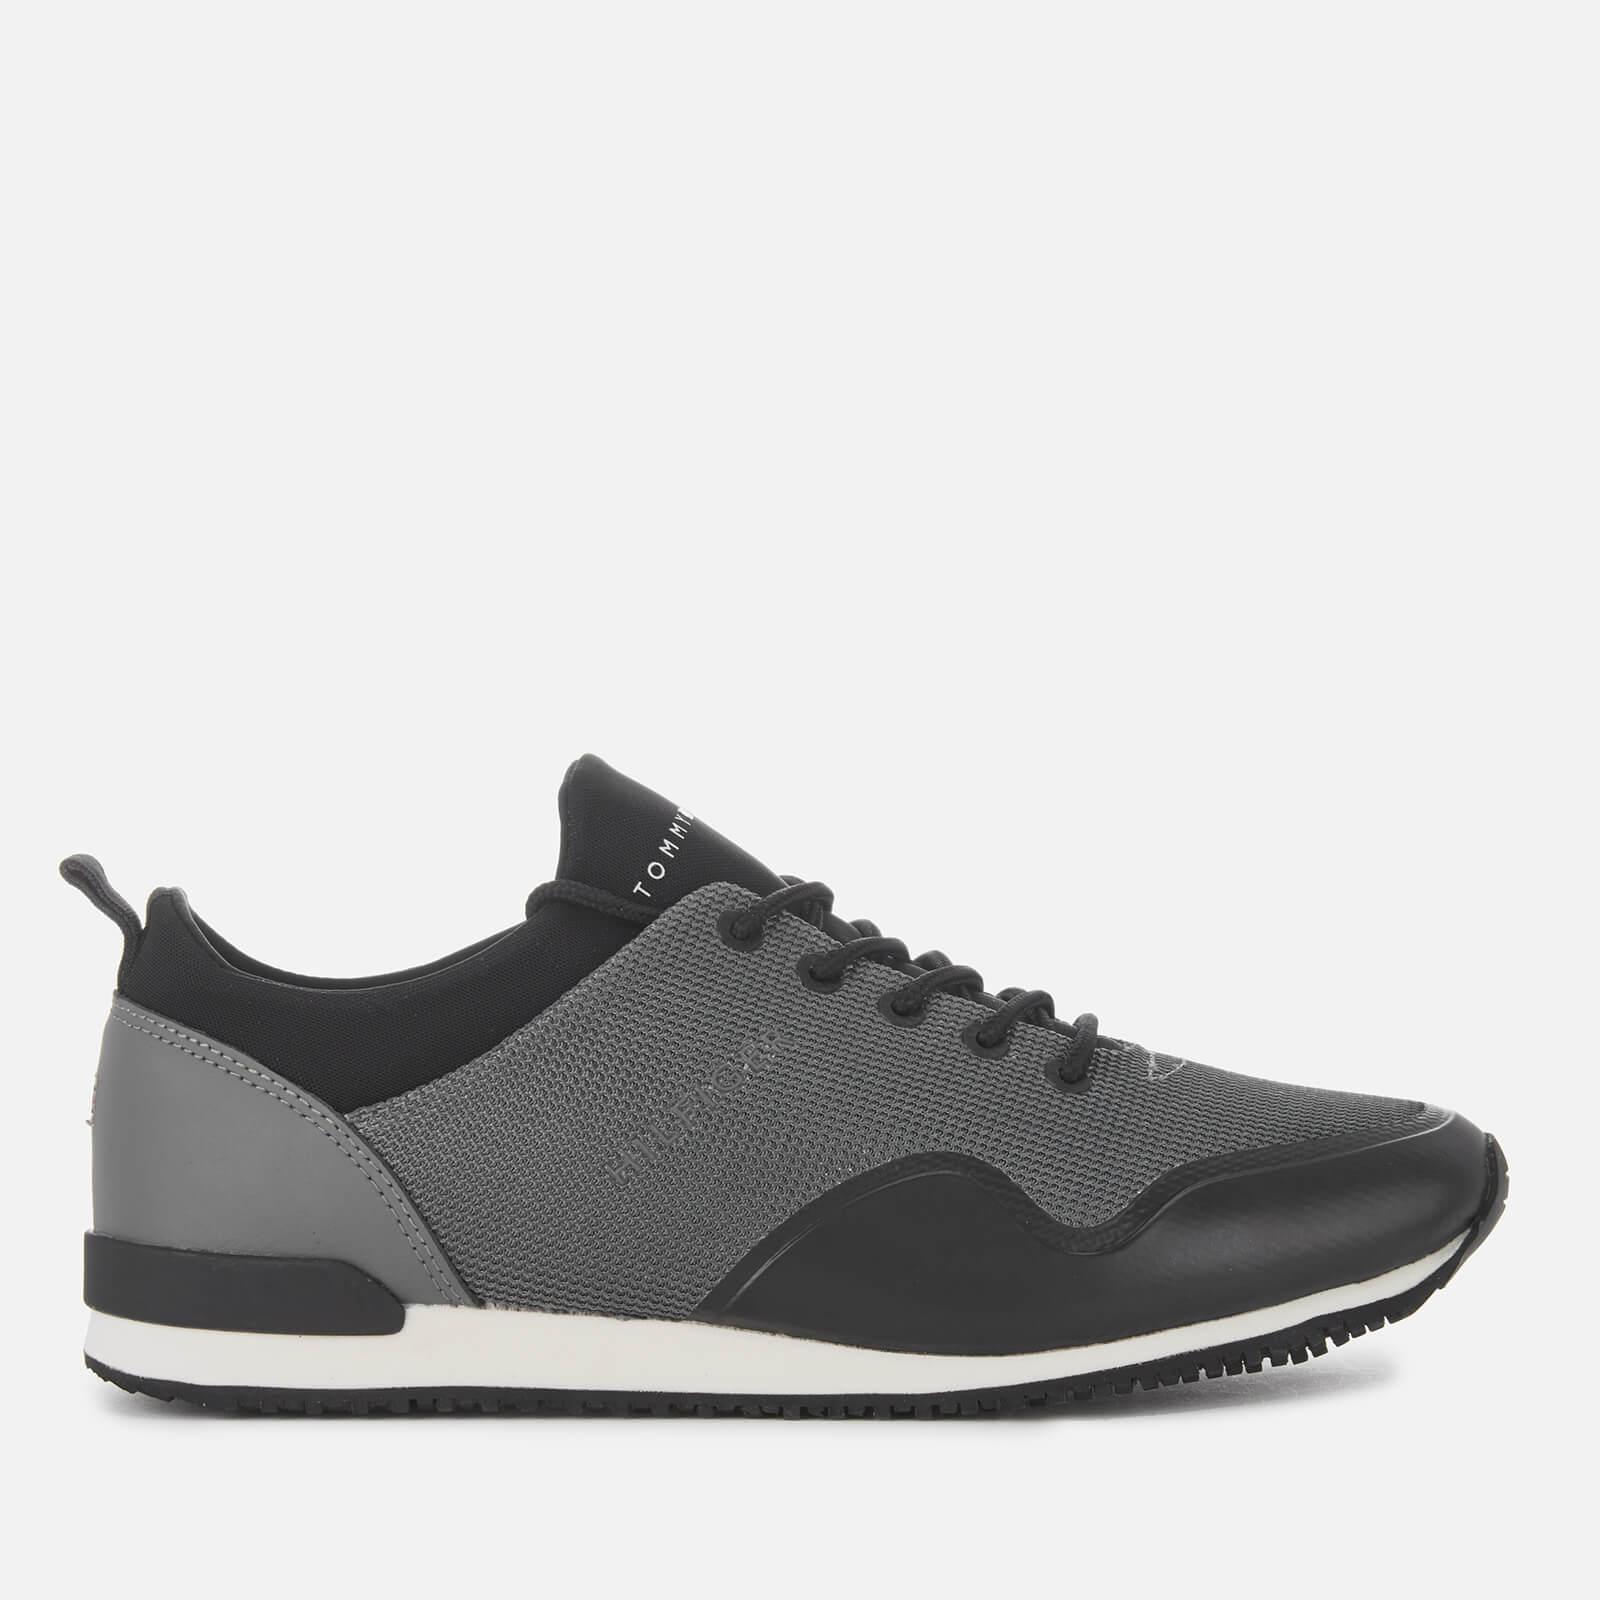 14afa23f5e8 Tommy Hilfiger Men's Iconic Neoprene Sock Runner Style Trainers - Steel Grey